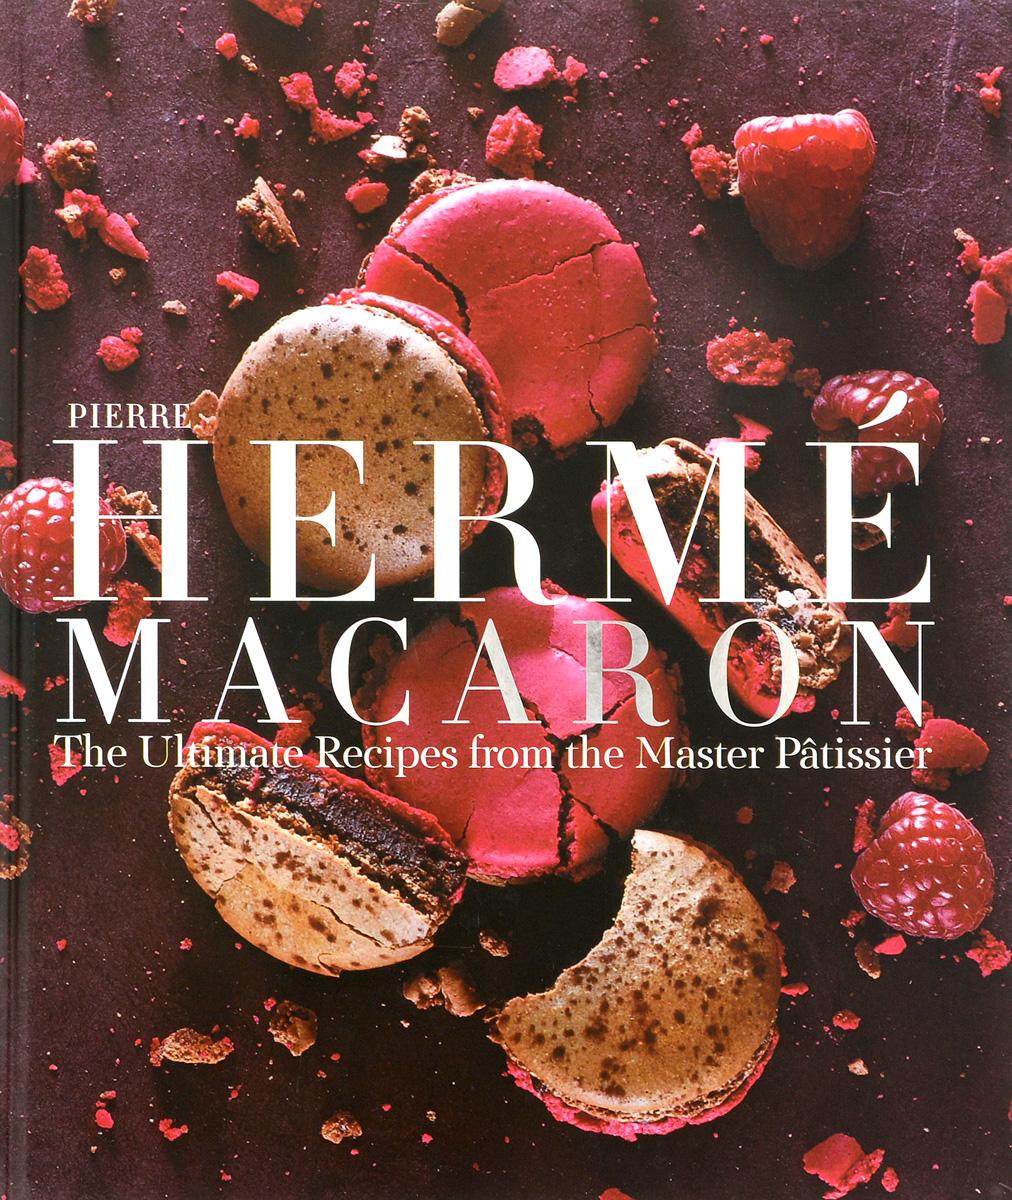 Pierre Herme Macaron kitchen pastry tools diy white plastic dumpling mold maker